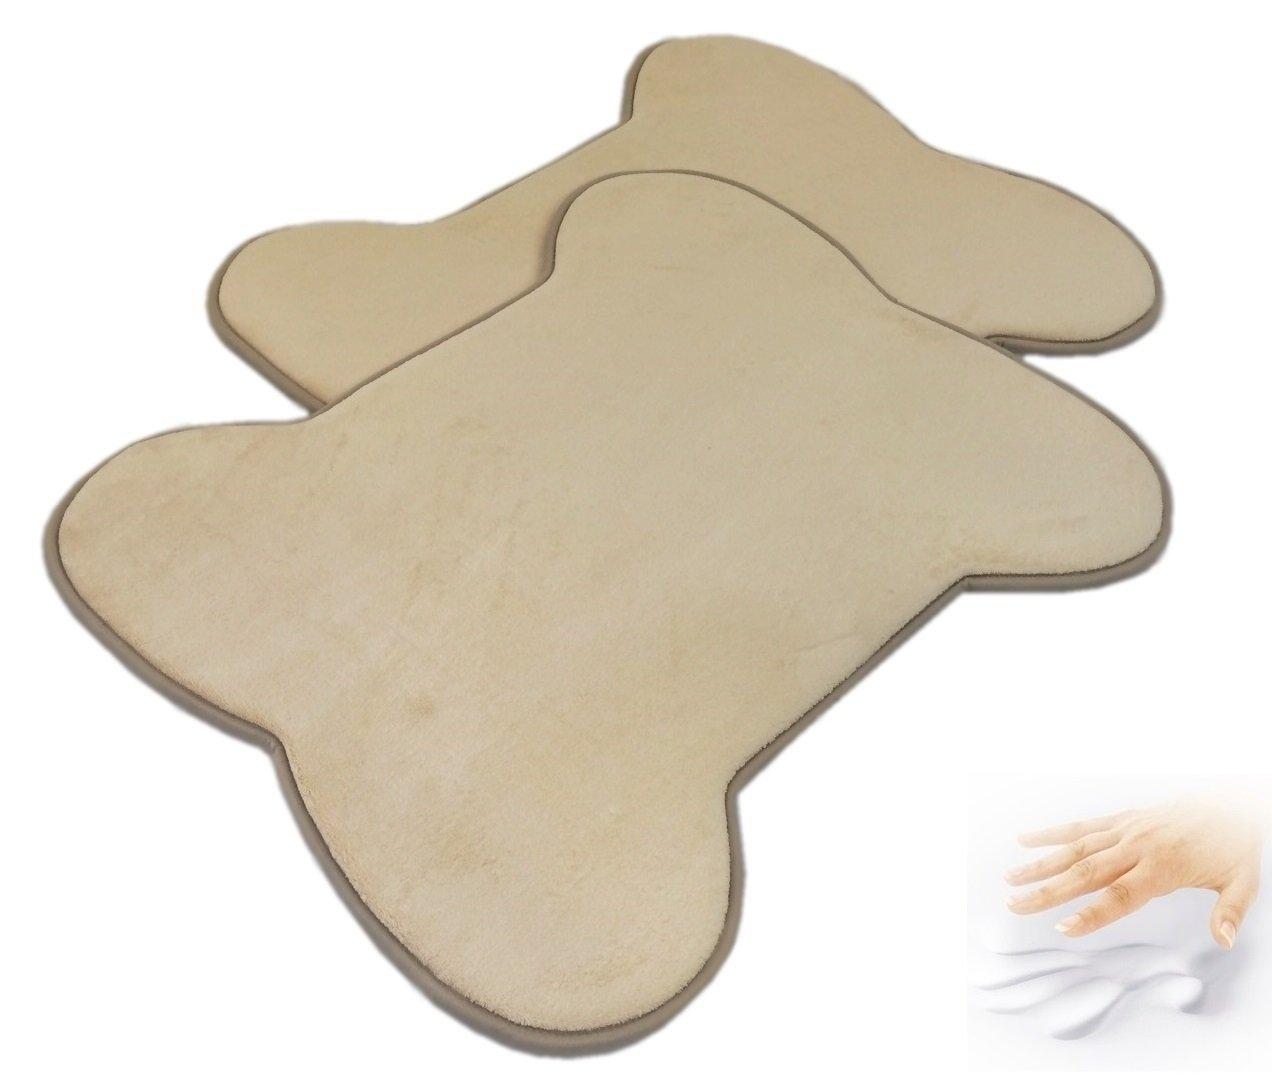 2 Quantity: Beige color Bone Shaped Fleece Comfort Soft Luxurious Memory Foam Waterproof Anti Slip MicroPlush Mat Pad Rug for home, kitchen, bathroom, bedroom, Pets, Activities.